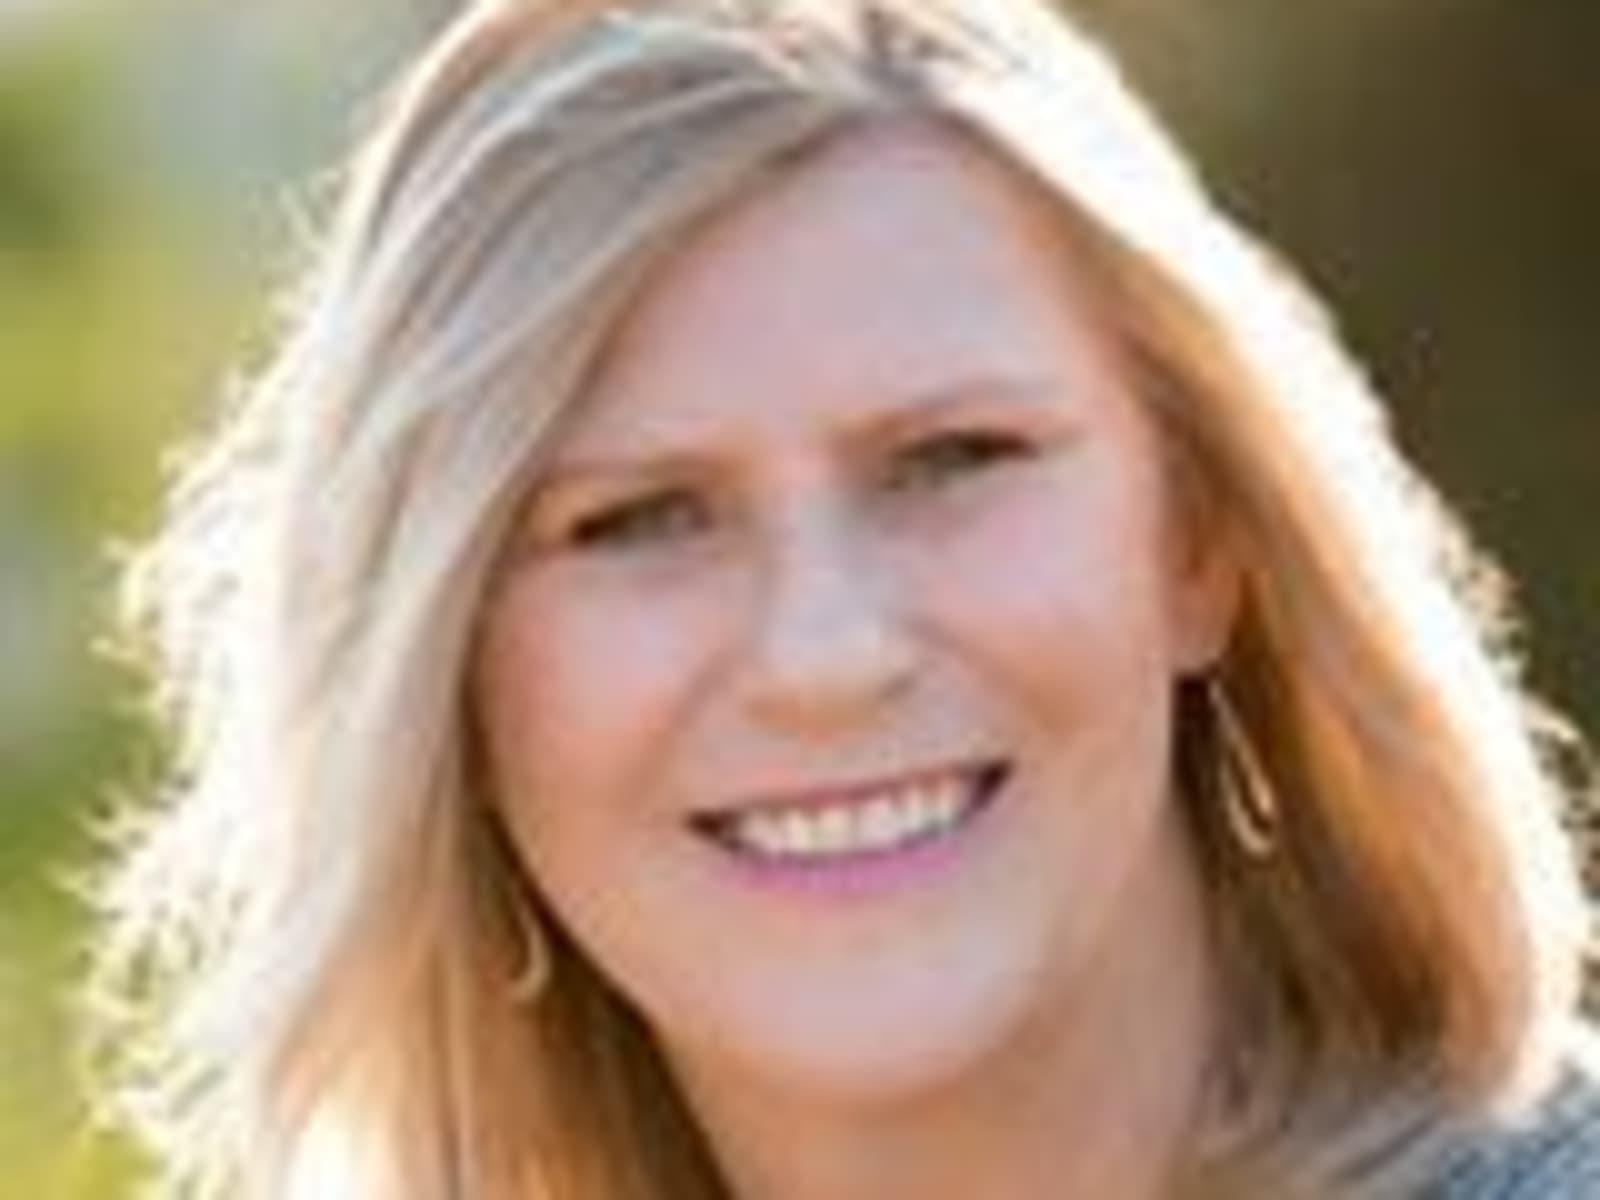 Lynne from Canberra, Australian Capital Territory, Australia